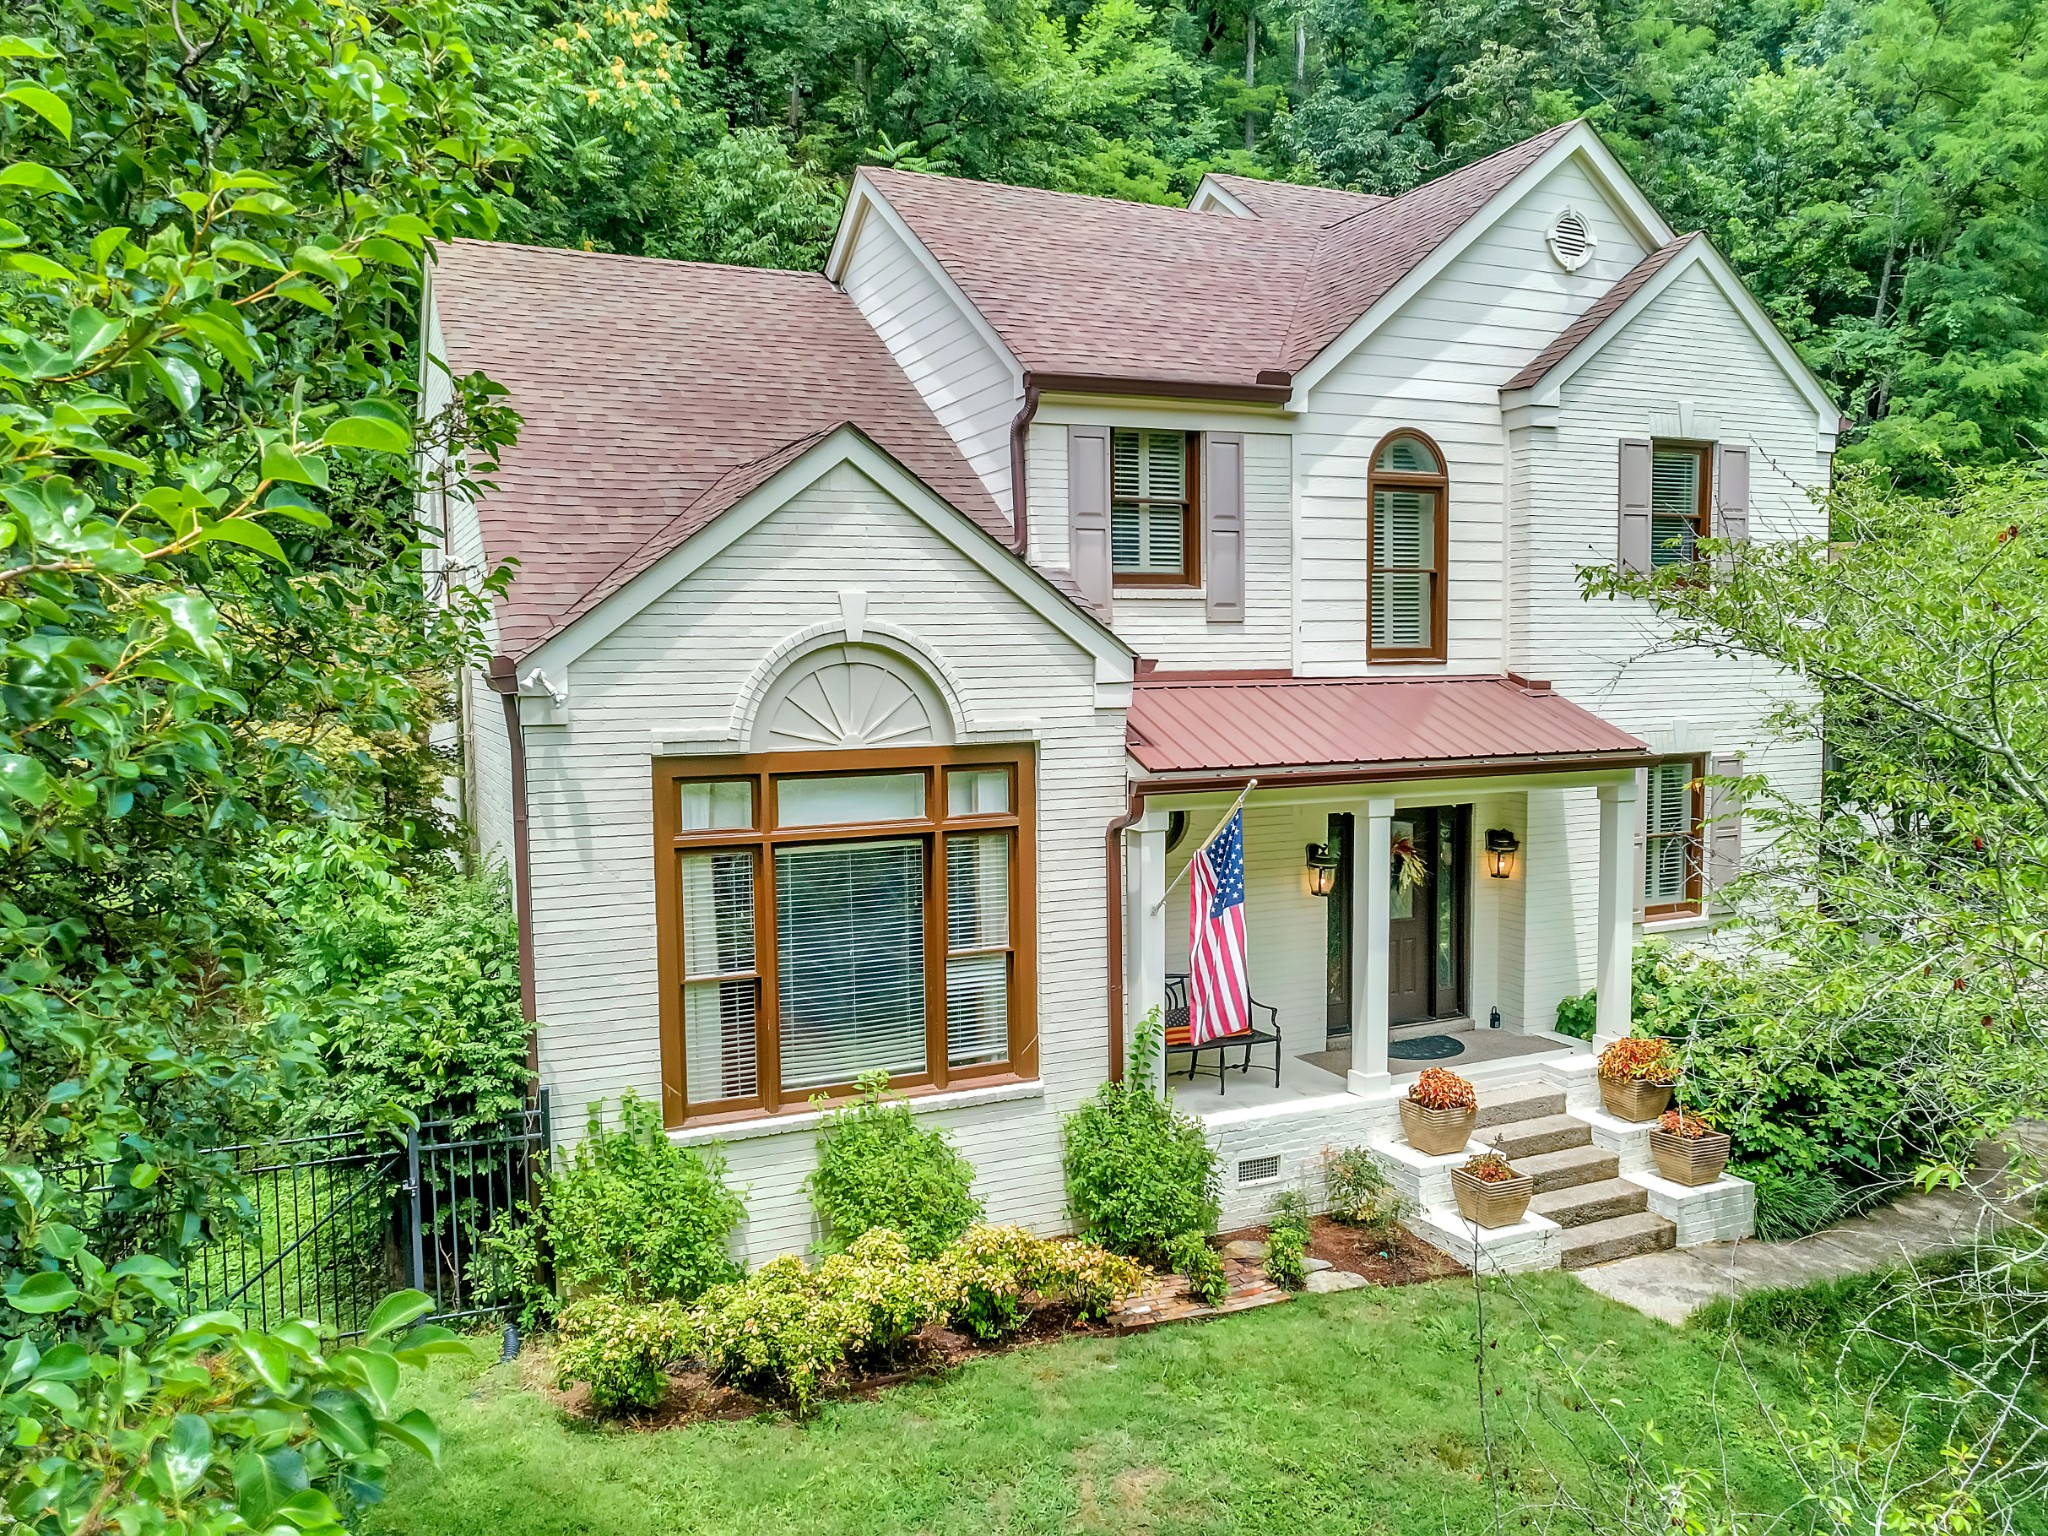 192 Carnavon Pkwy Property Photo - Nashville, TN real estate listing